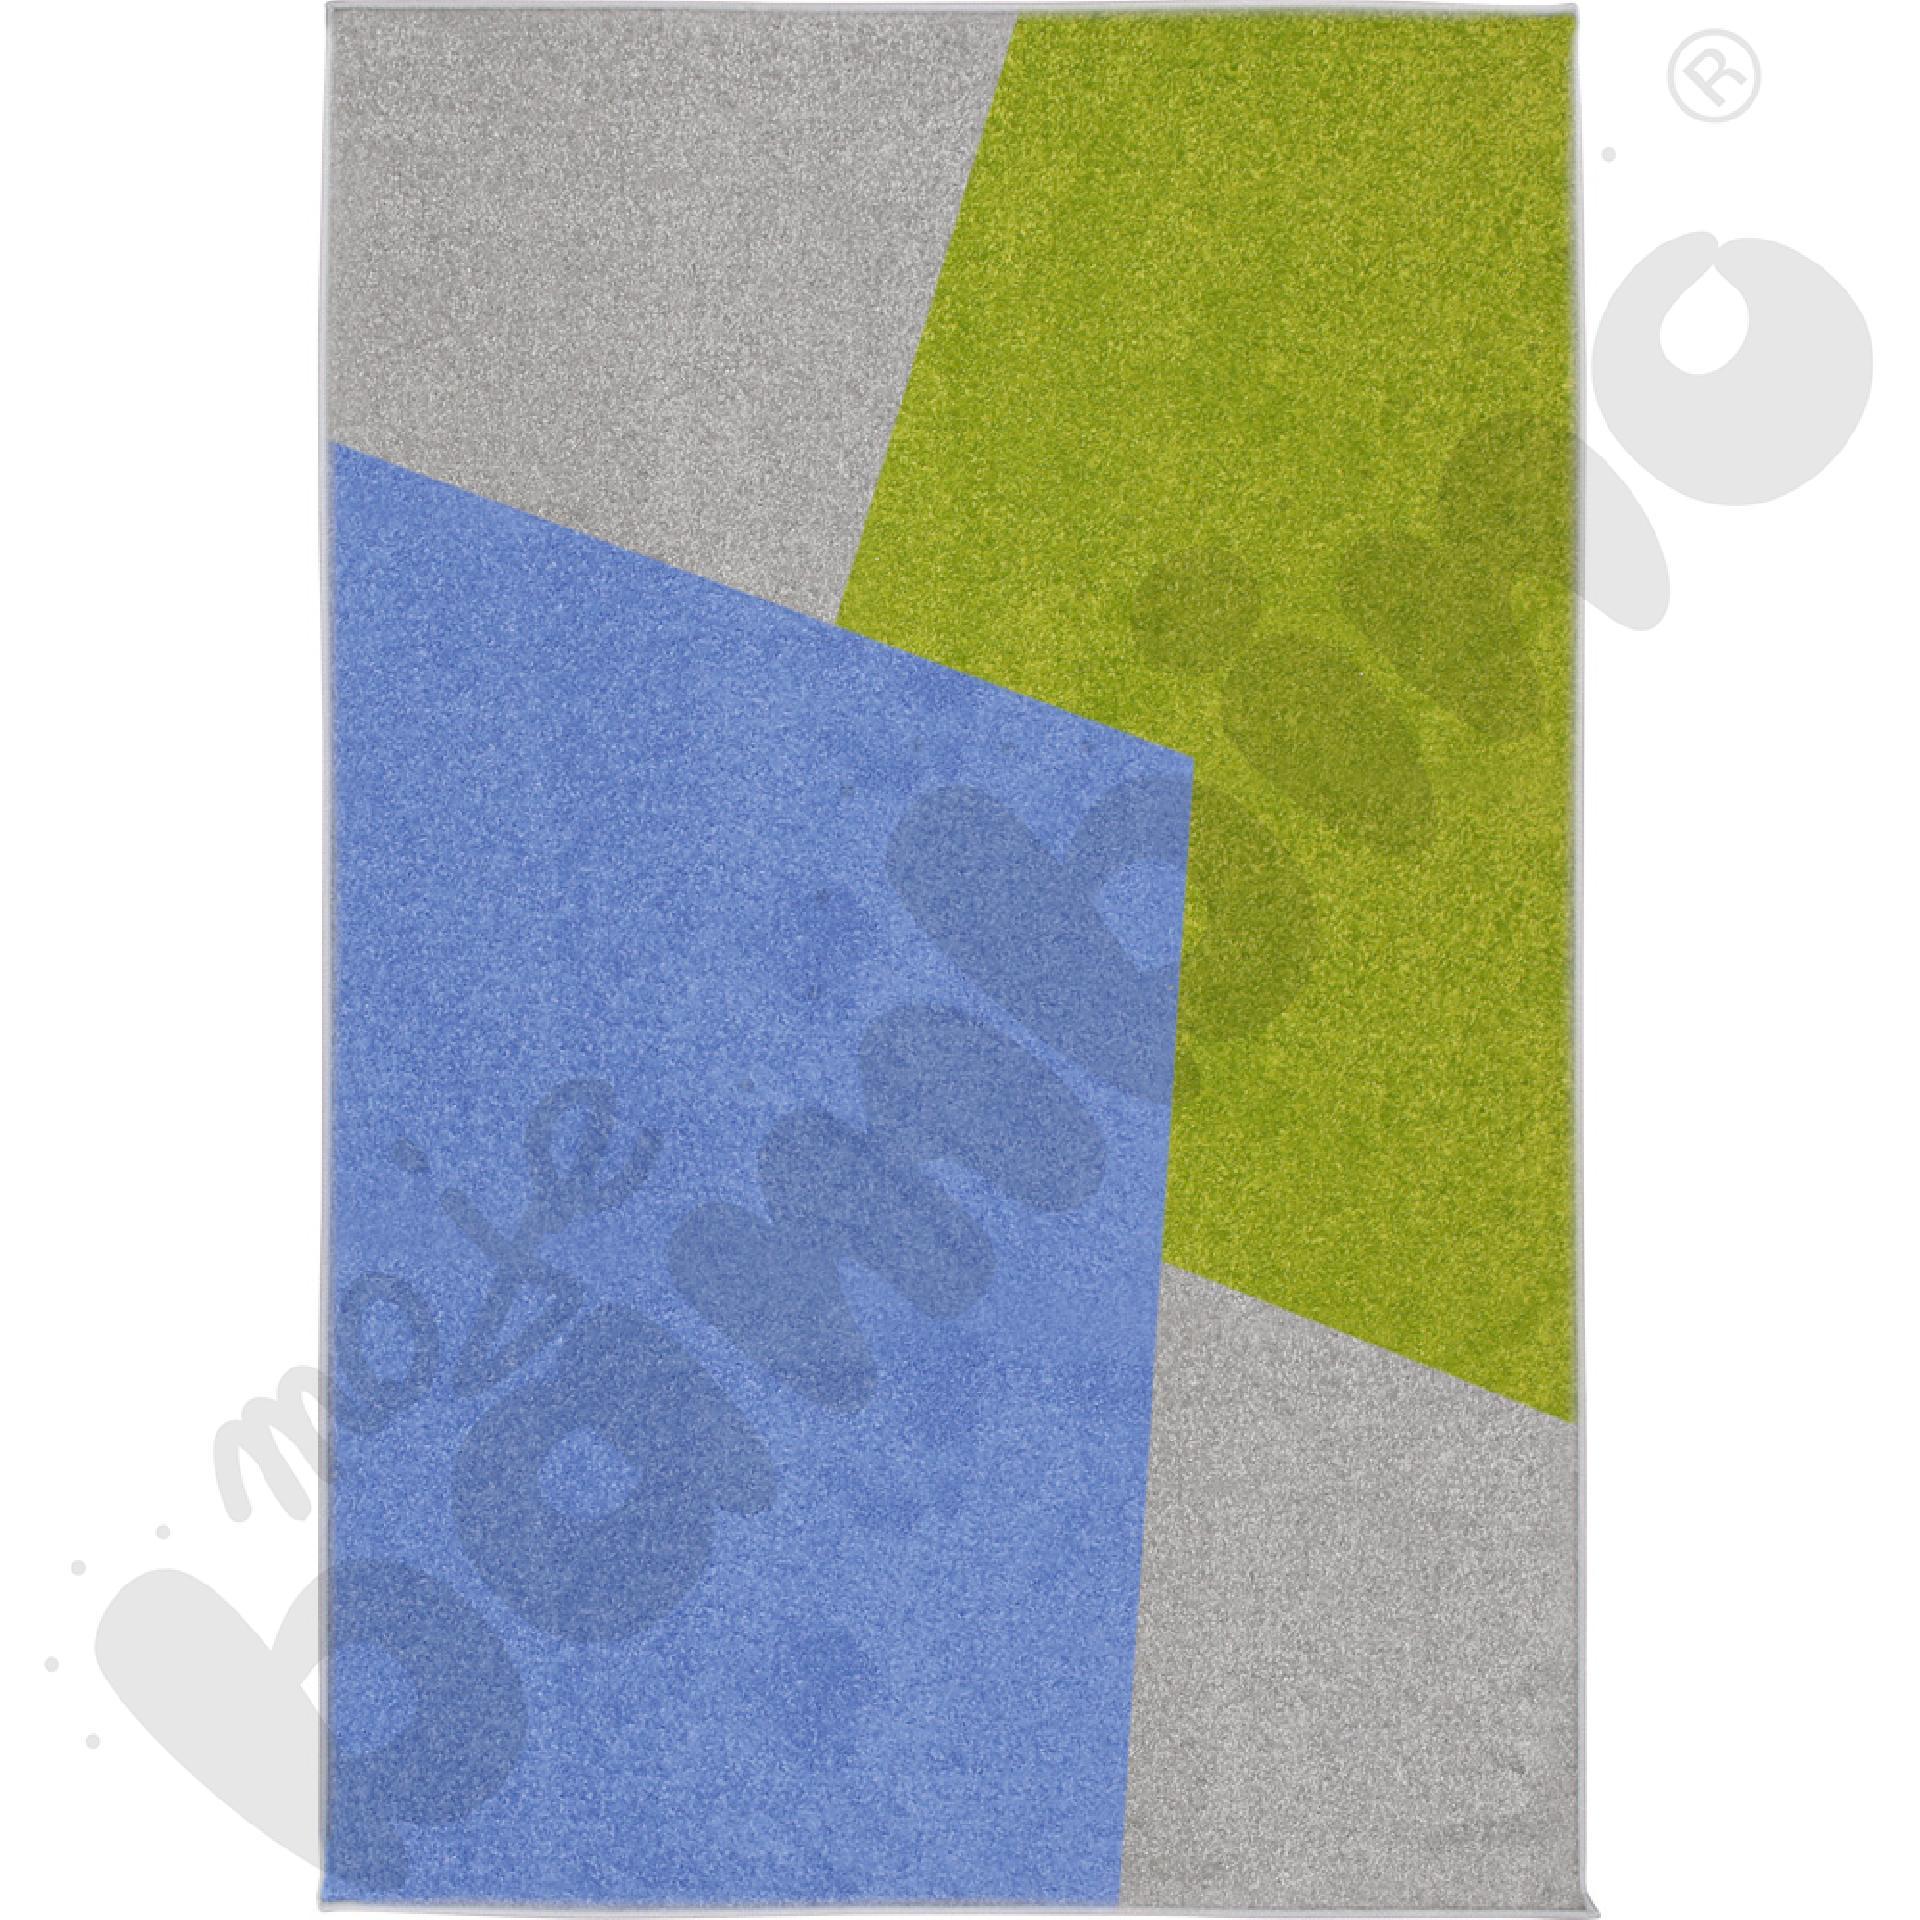 Dywan forma i kształt 3 x 4 m